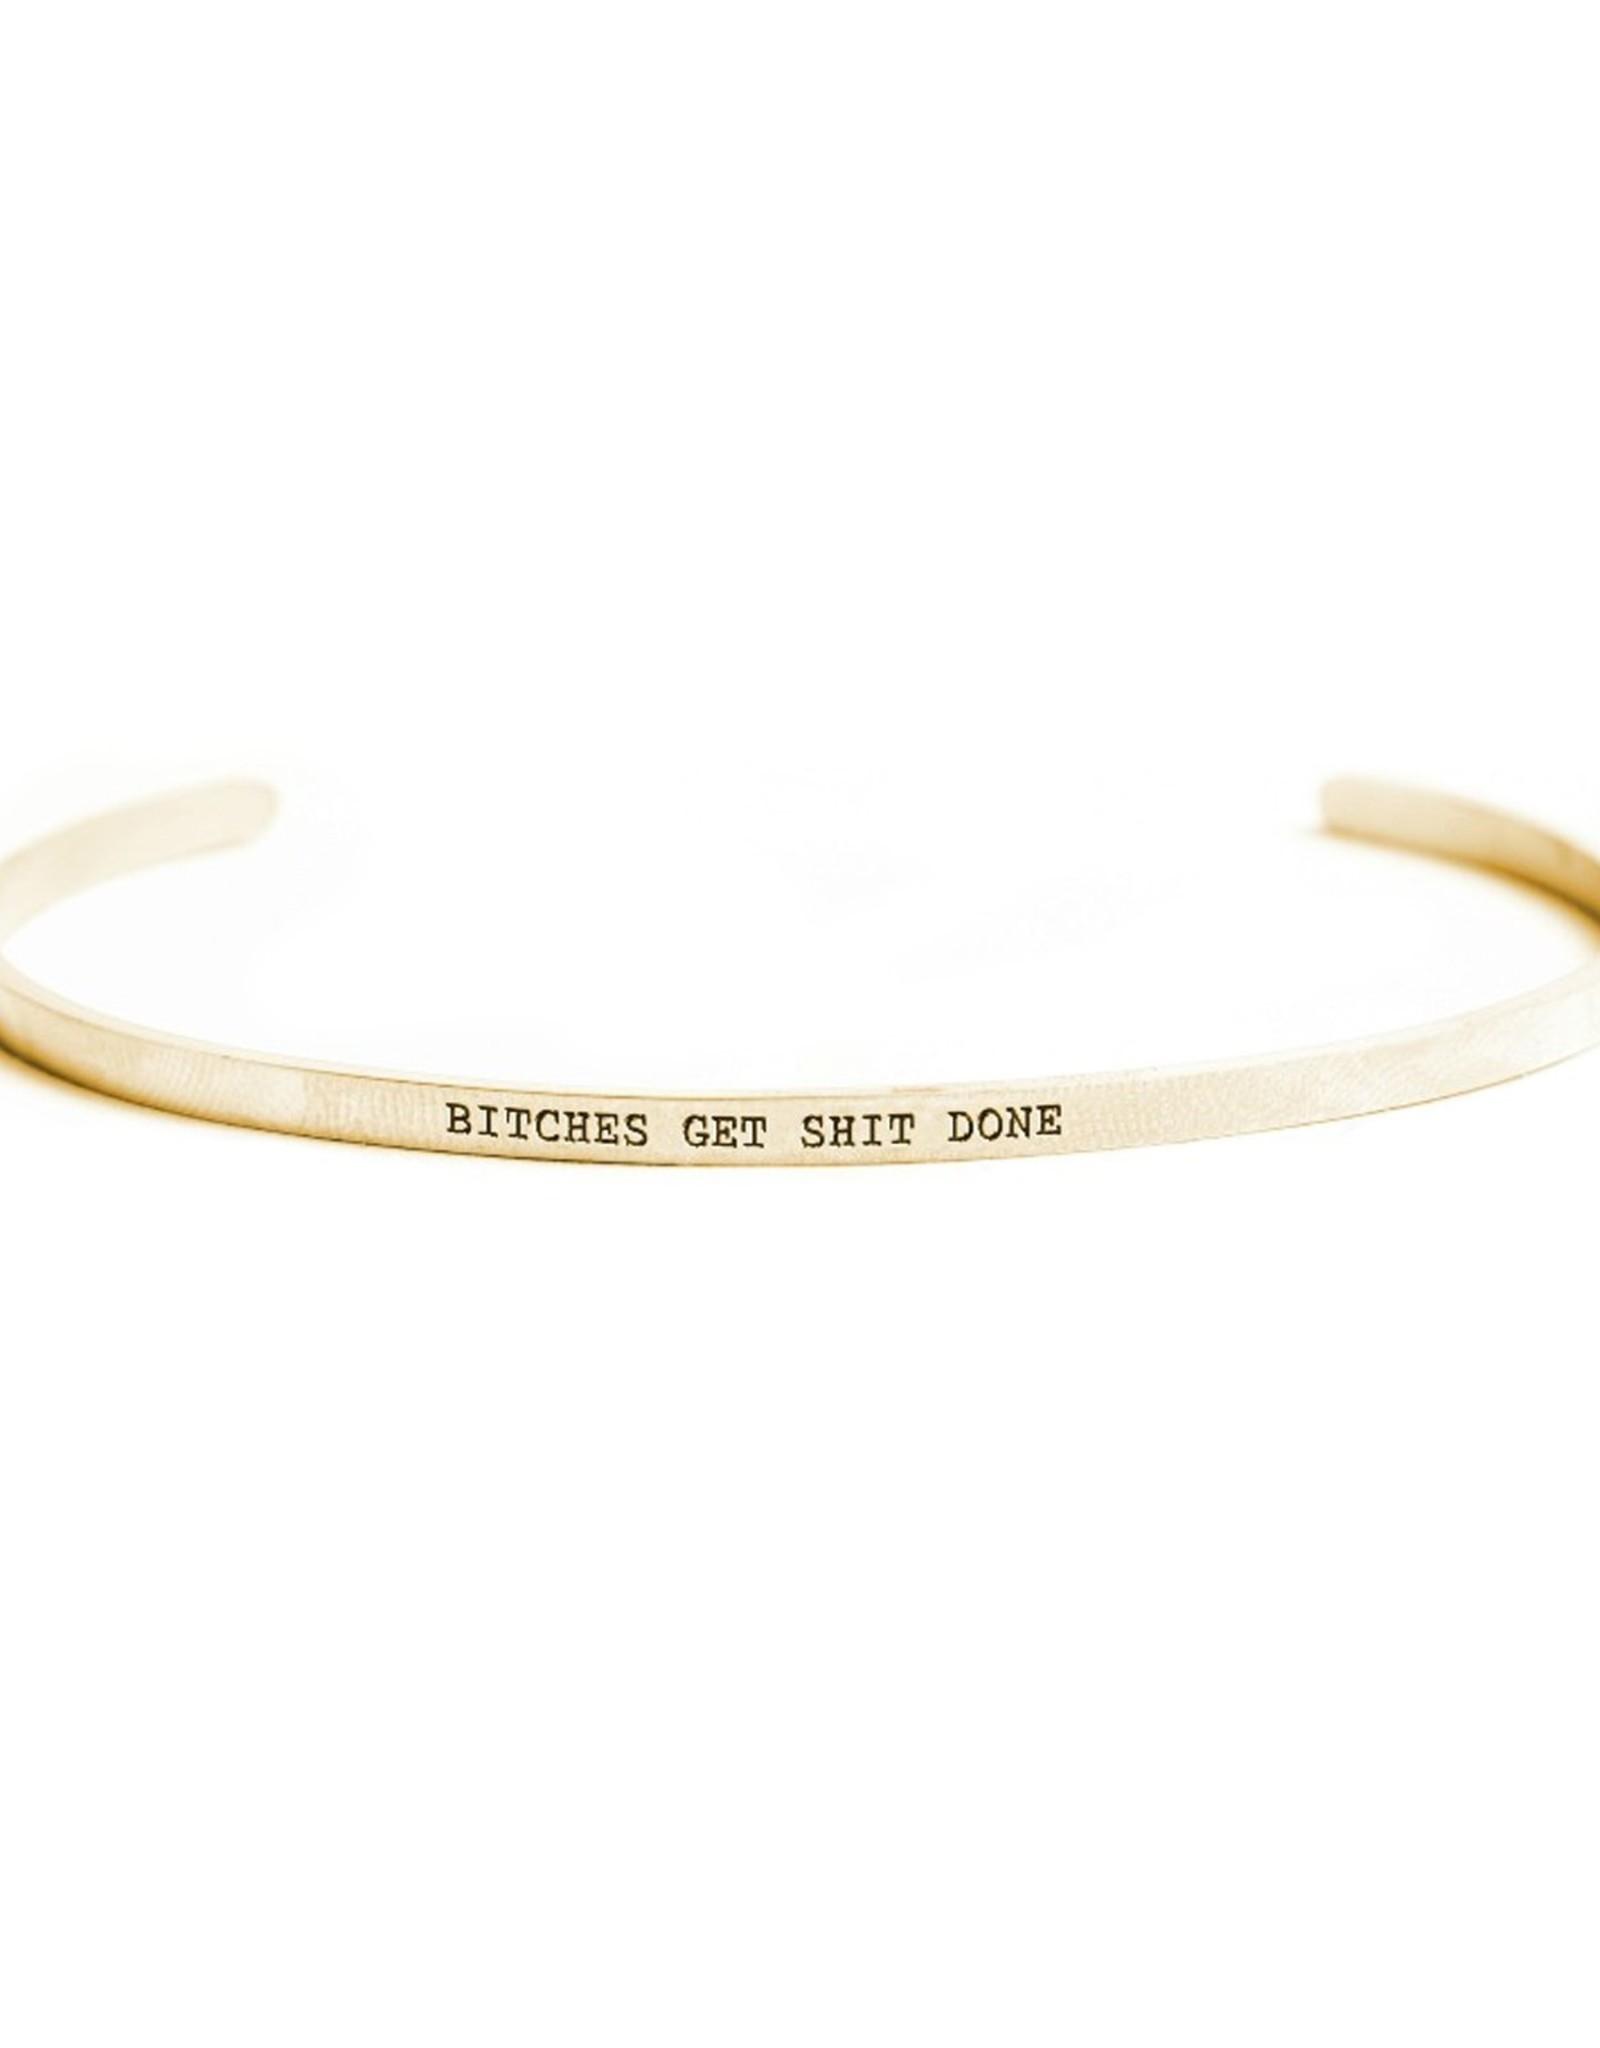 Bracelet - Bitches Get Shit Done (14k Gold)